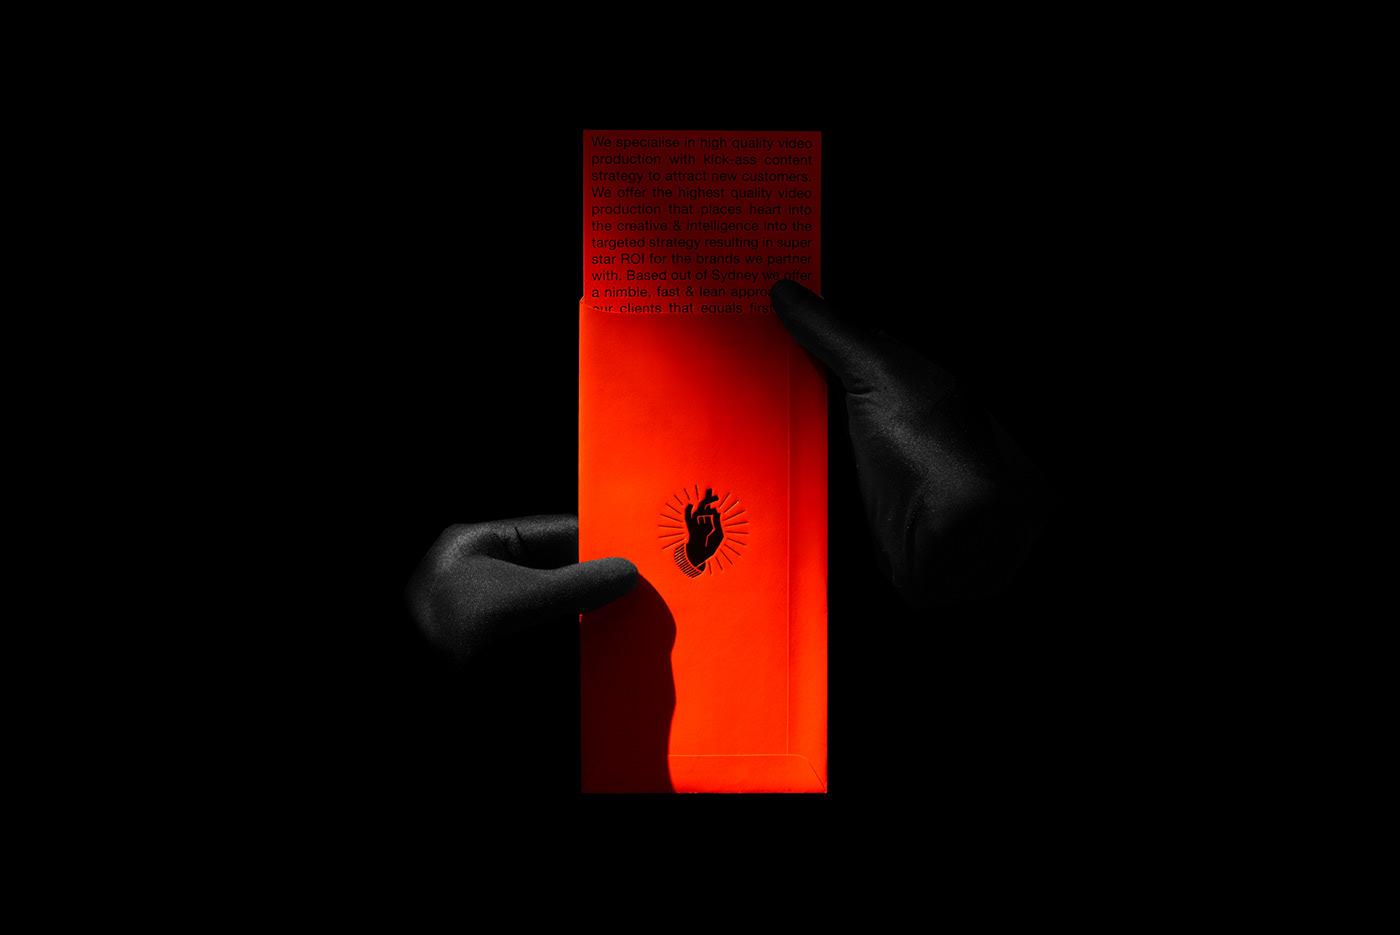 apostle digital electric blood gmund sydney ElectricBlood redneon neon red